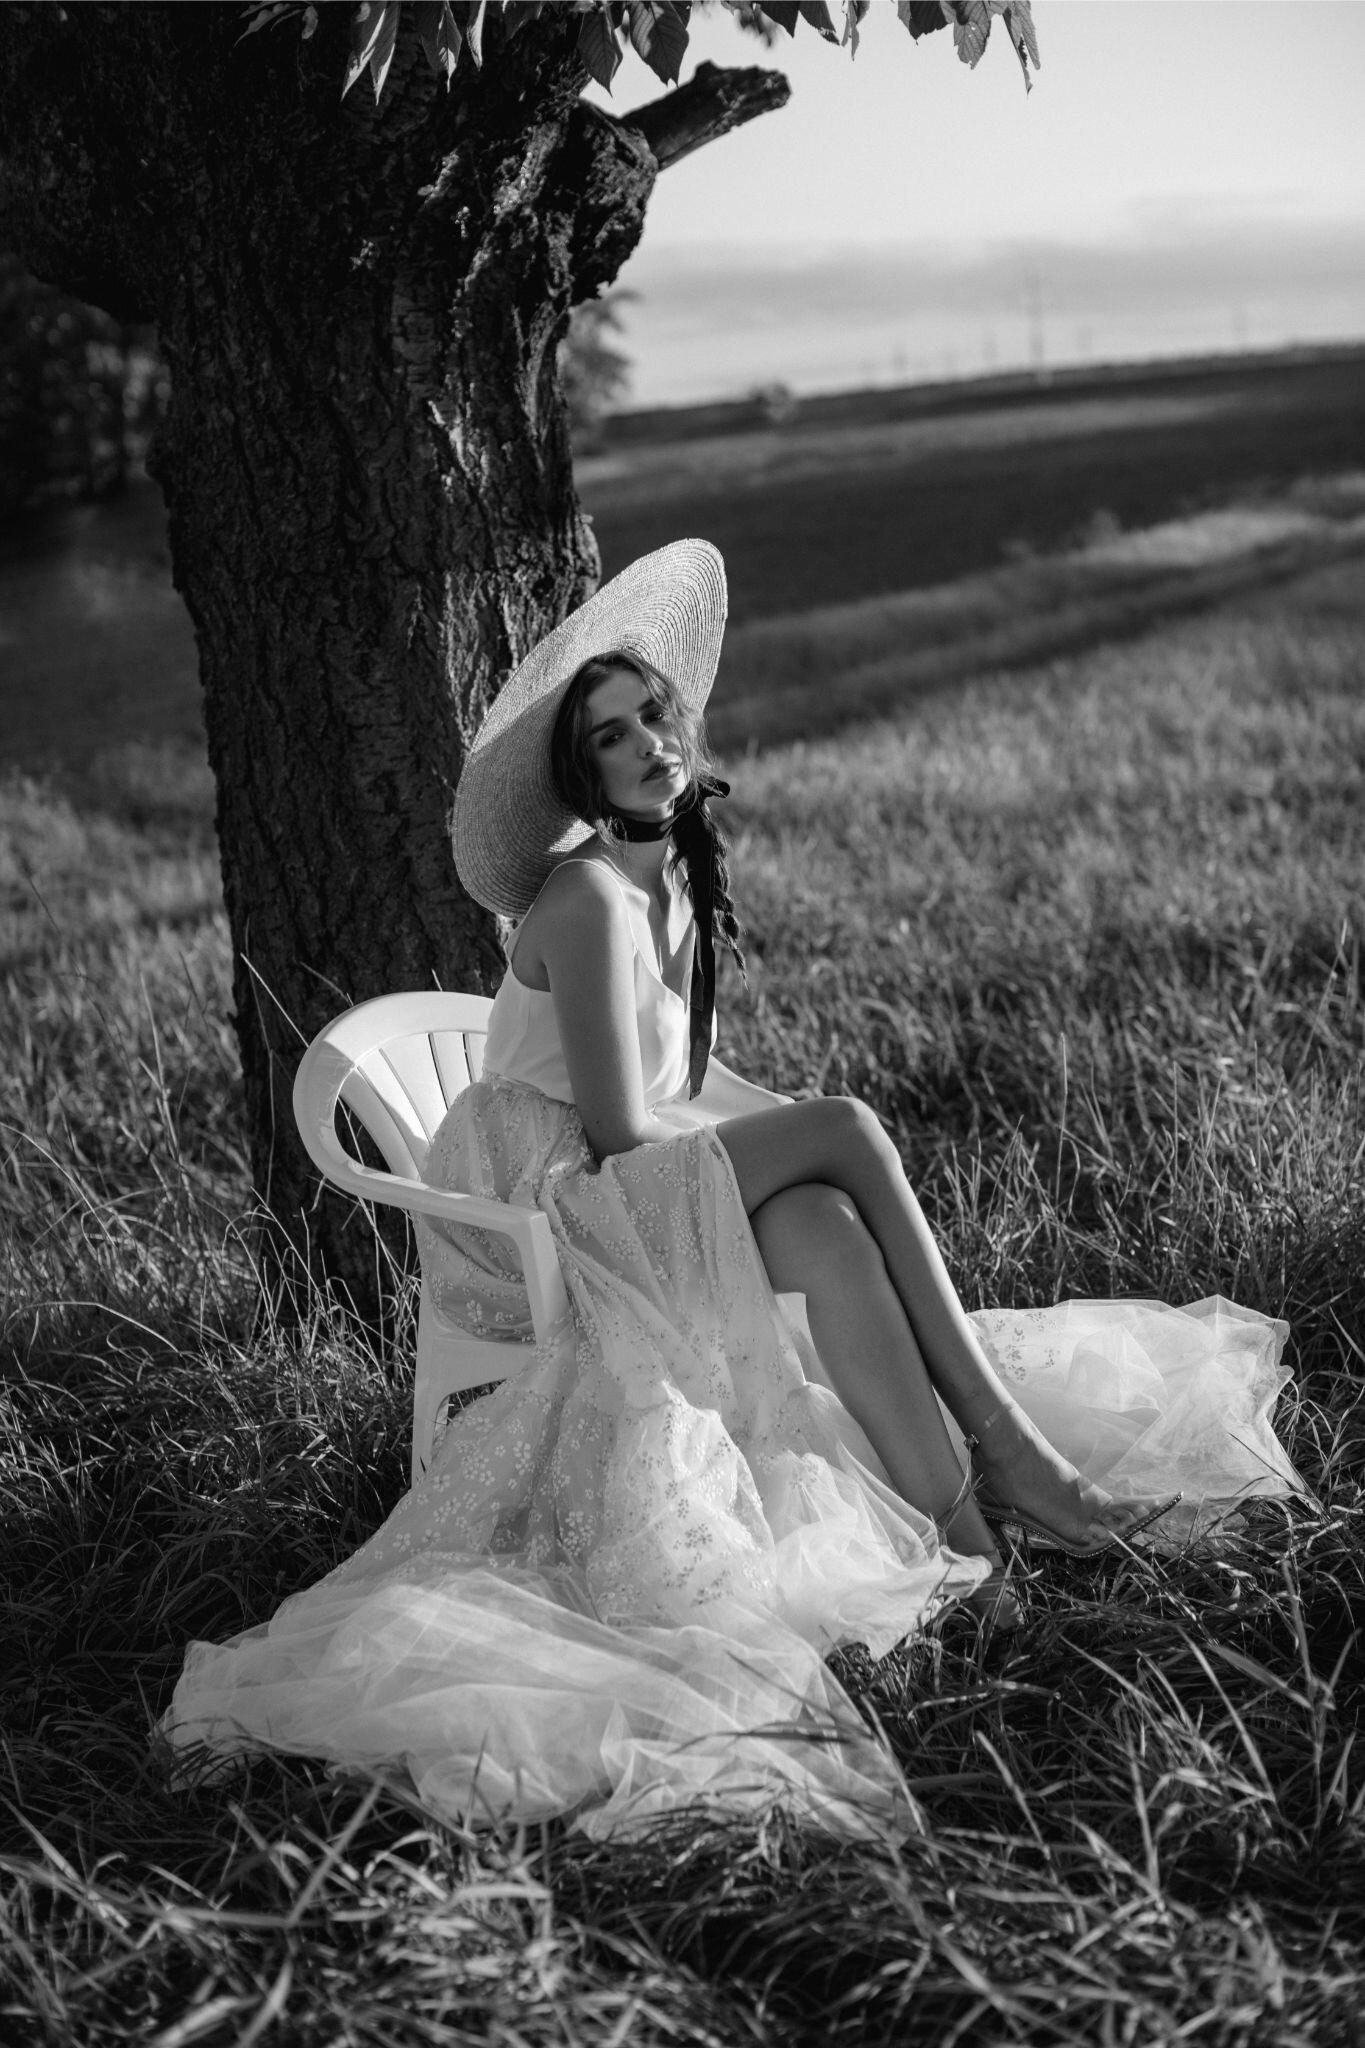 the-saums-bebas-closet-germaine-skirt-summer-bride-fashion-editorial-4.jpg